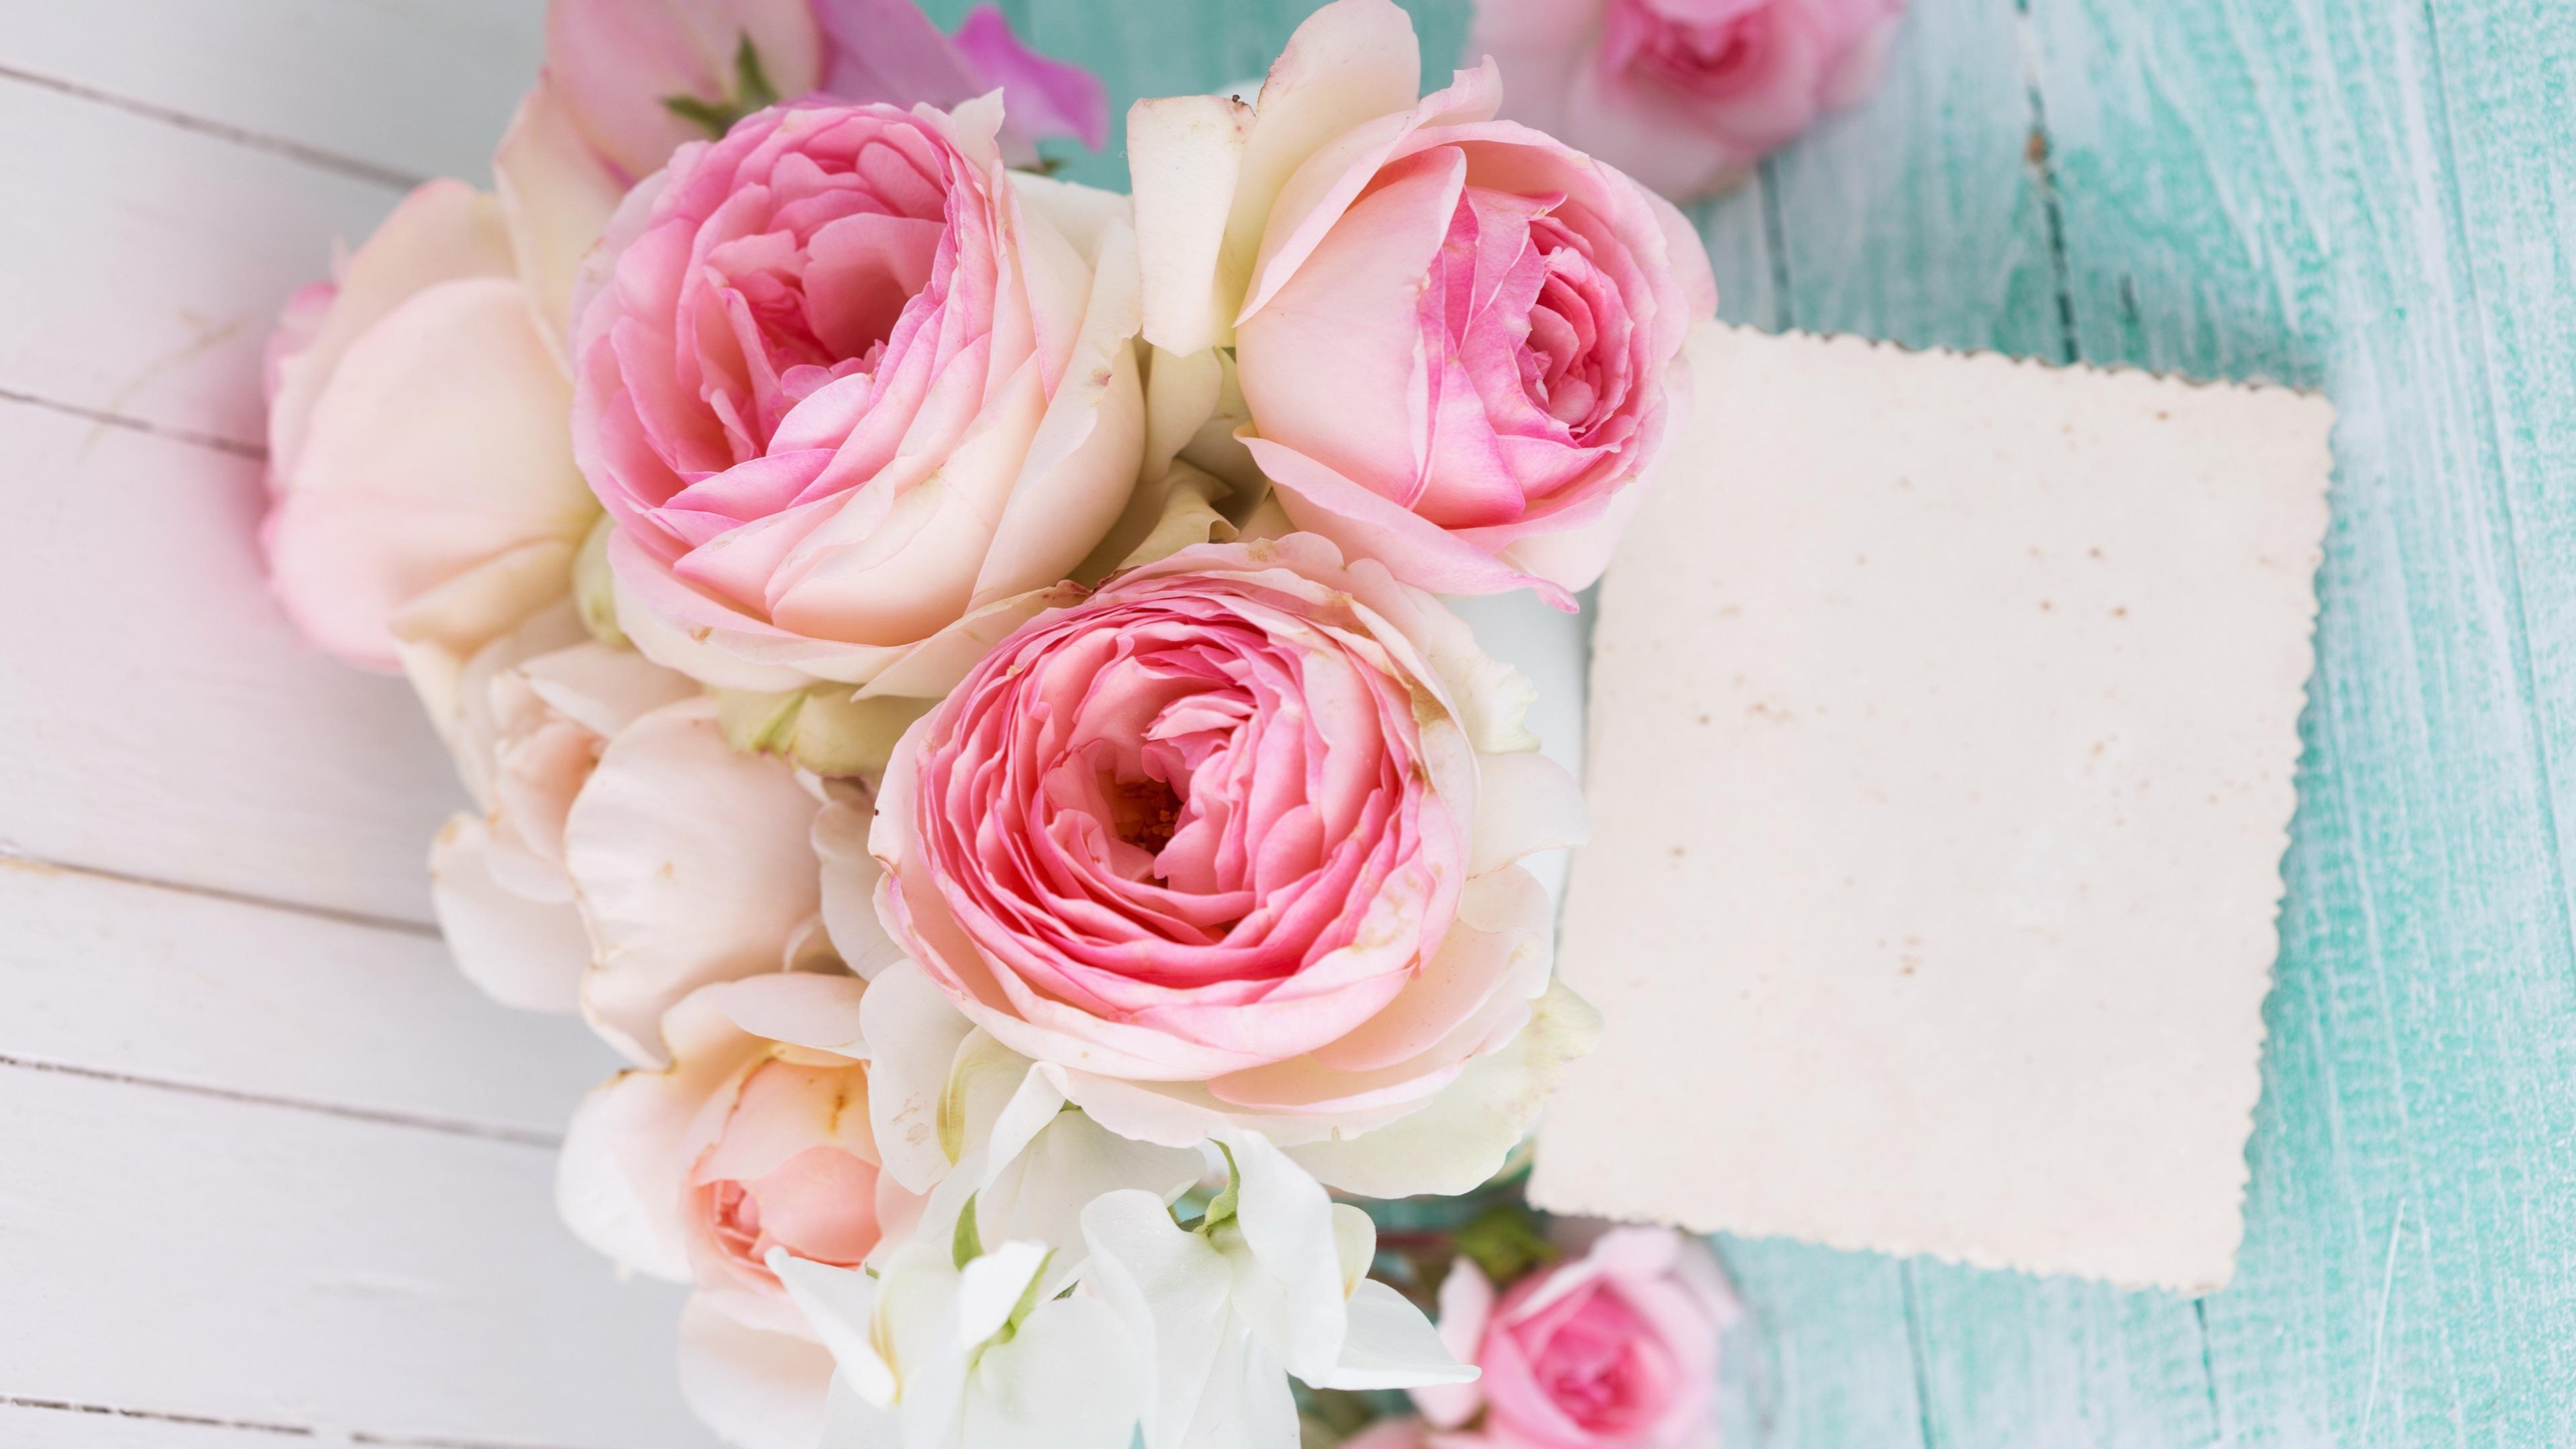 открытка с нежно розовыми цветами маки фото